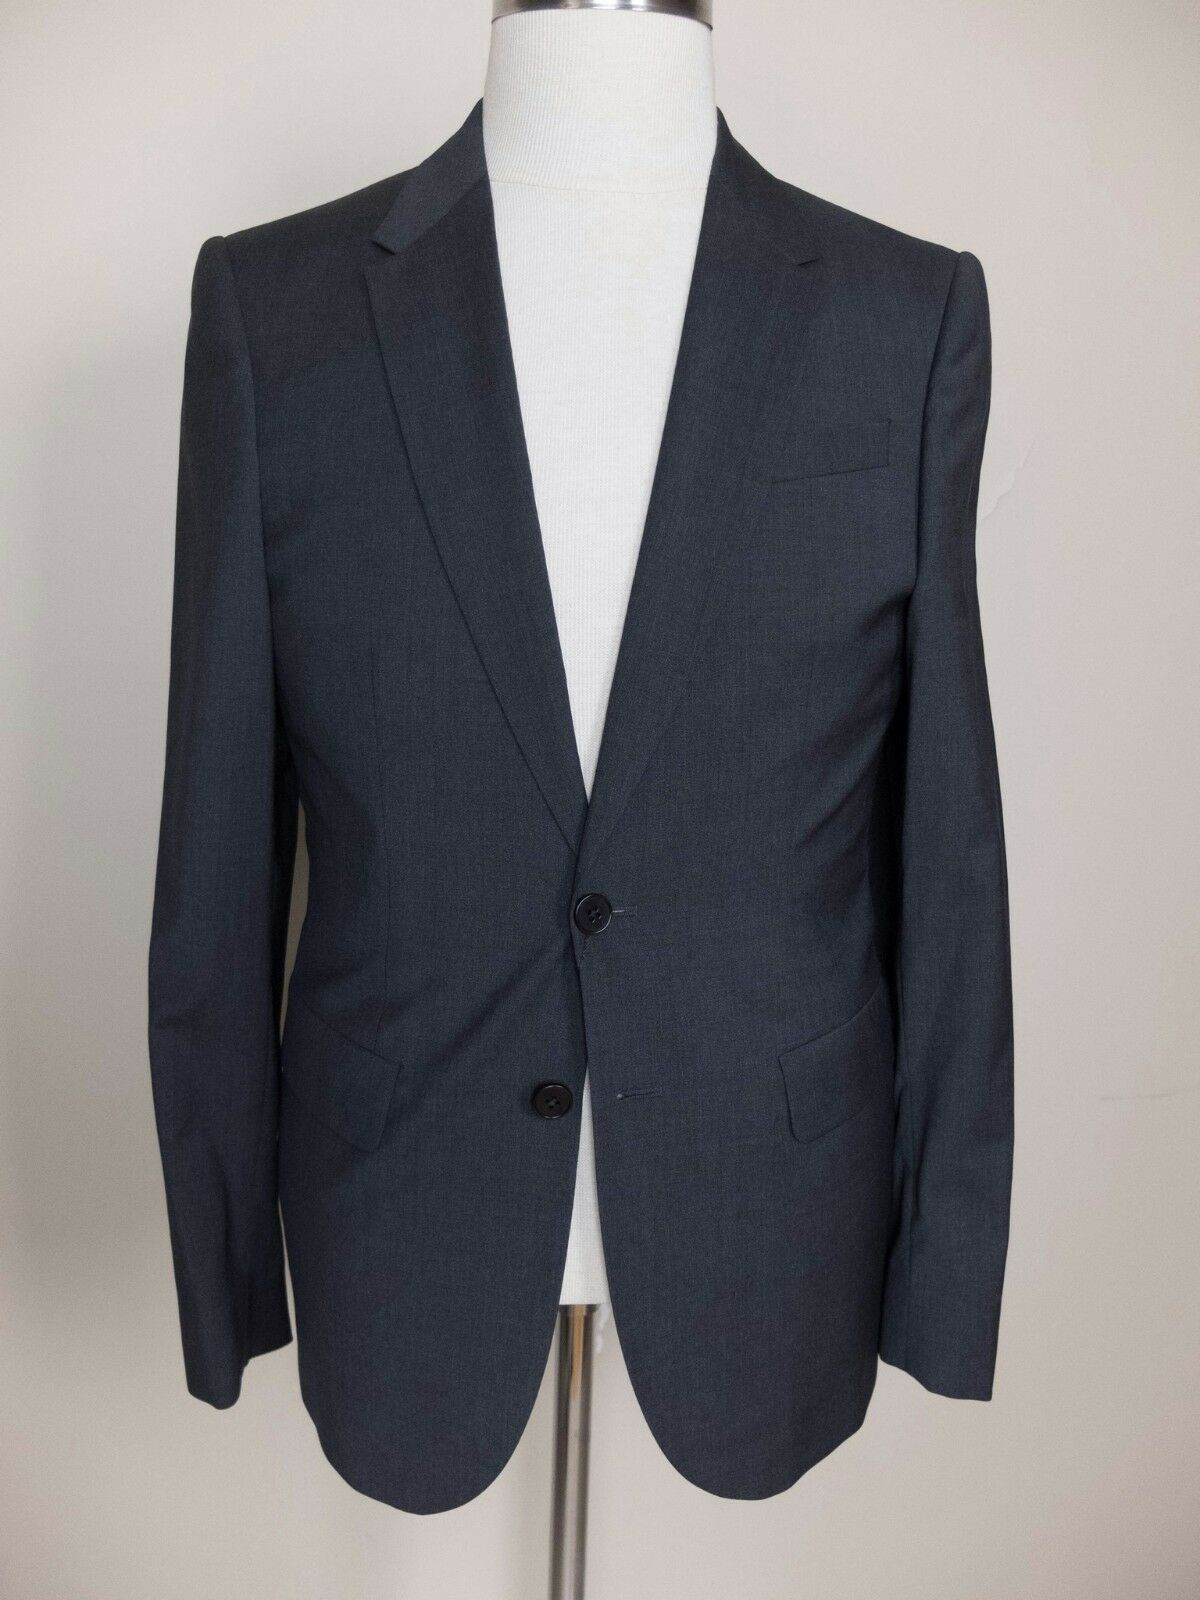 PS PAUL SMITH slim-fit two-button solid grau wool suit - Größe 38 US / 48 EU NWOT